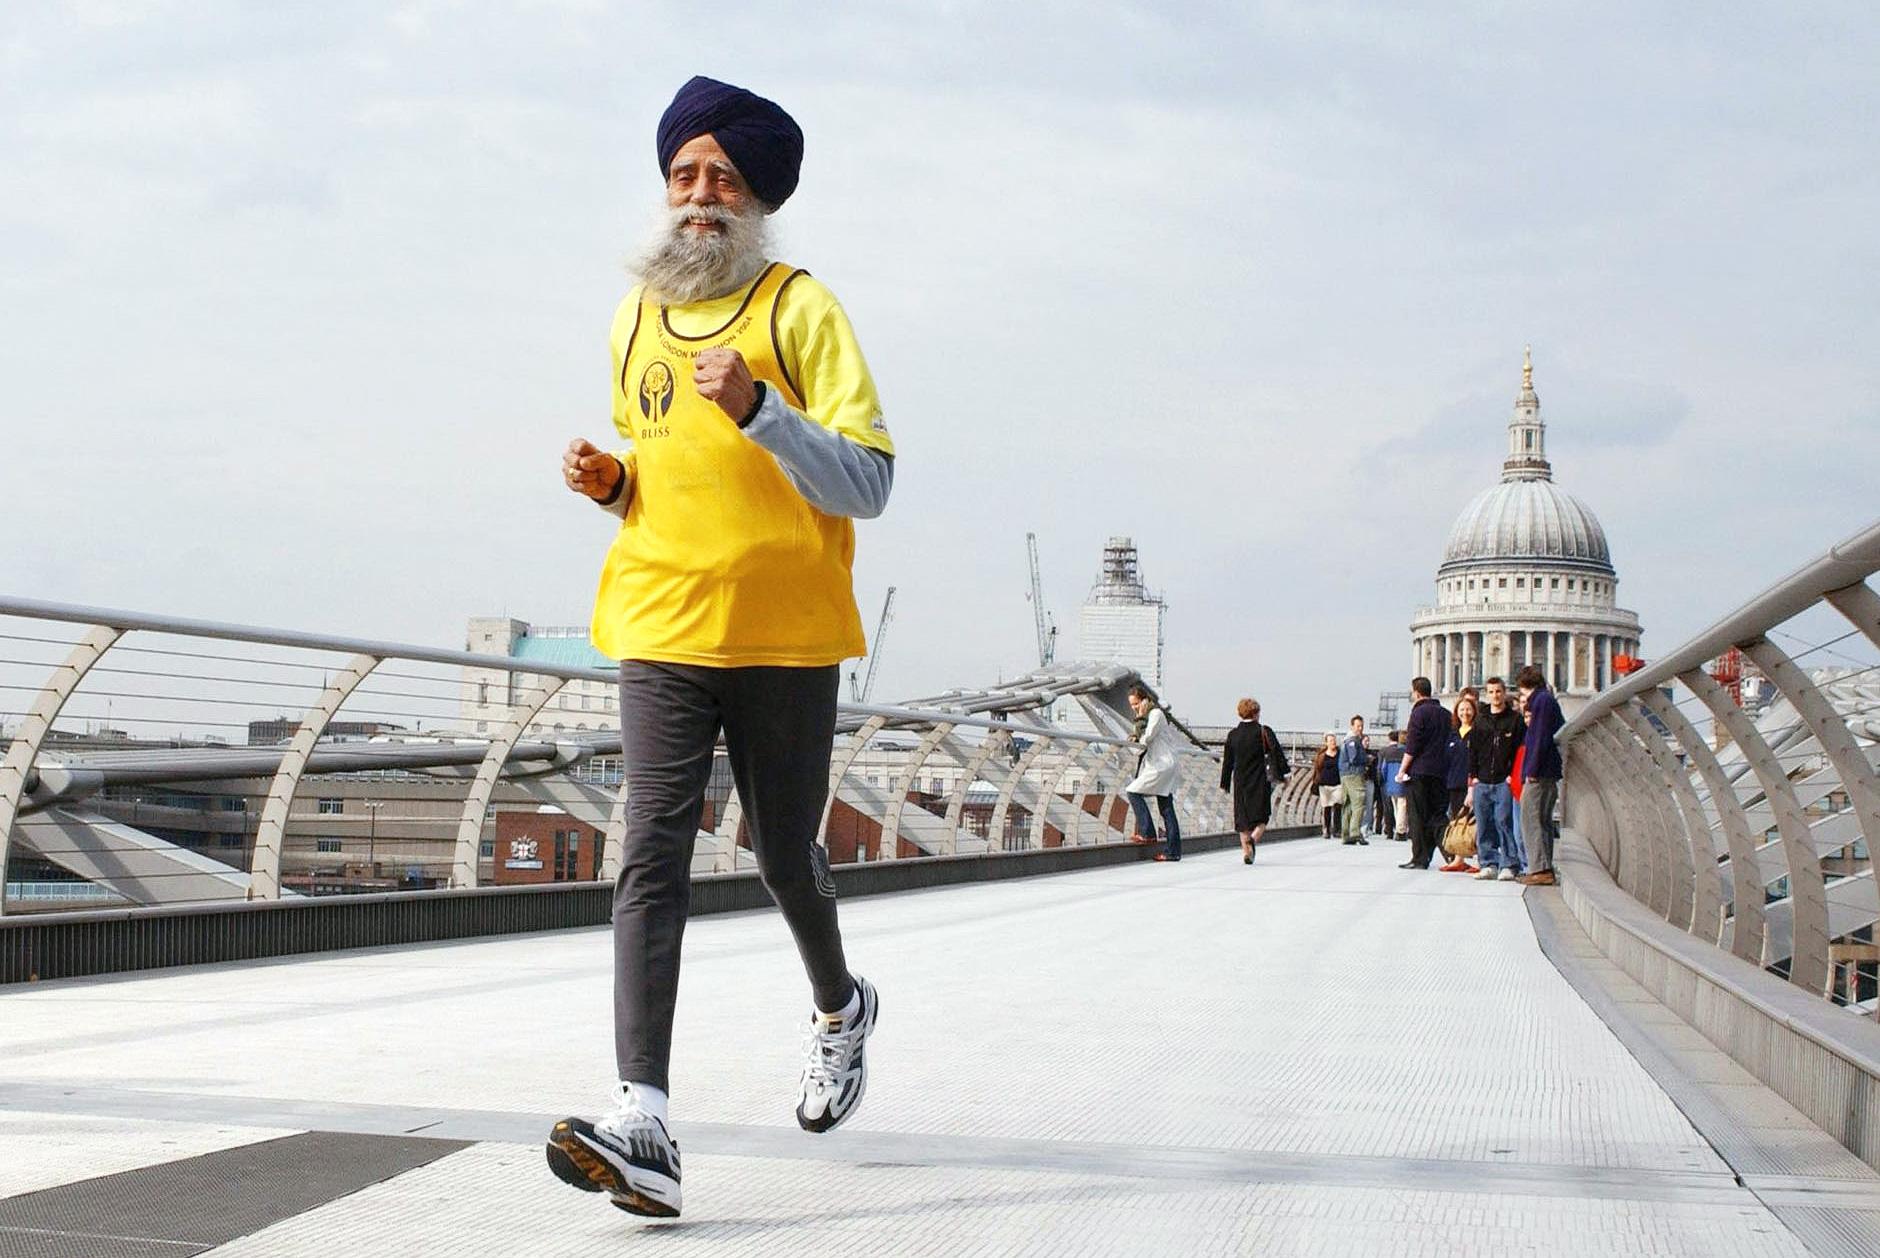 Fauja Singh running